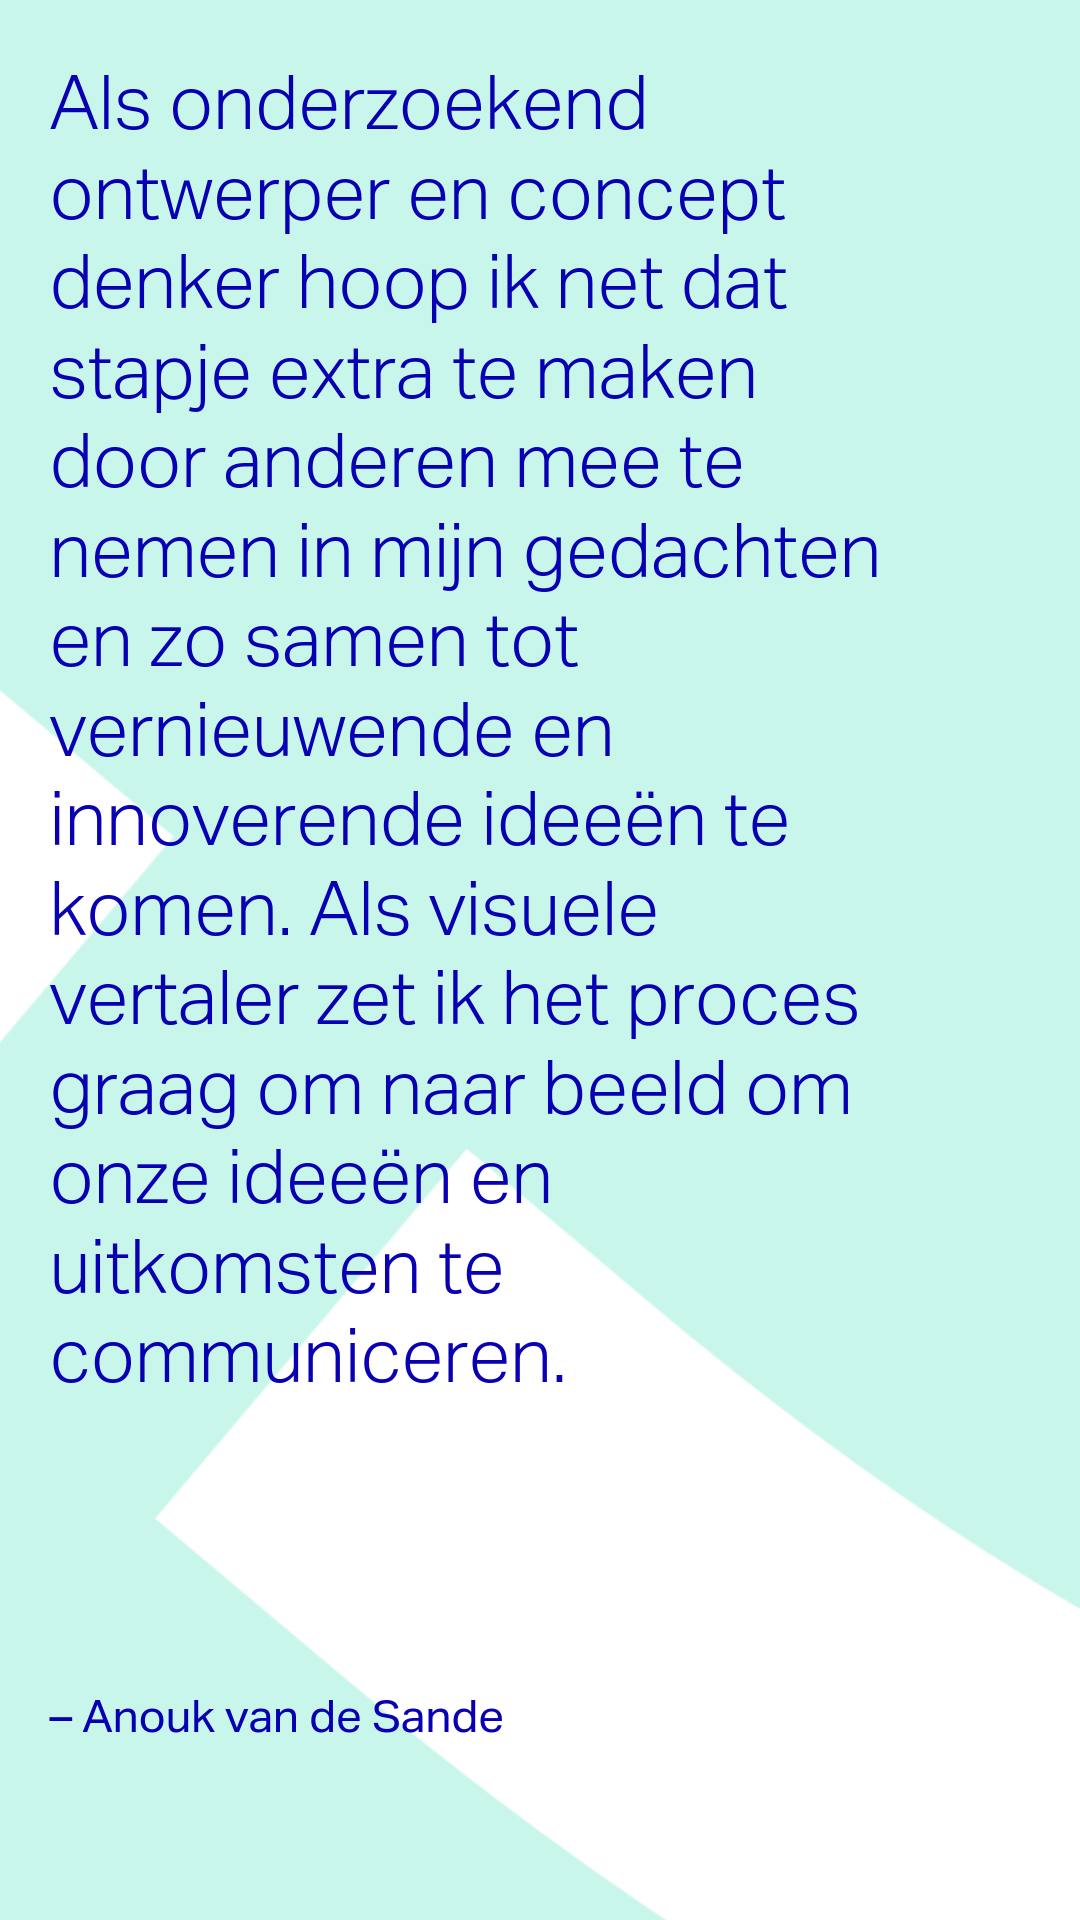 Taskforce-Fashion-Fashion-After-Flood-Kennismaking-Maastricht-Anouk-vande-sande_4.png